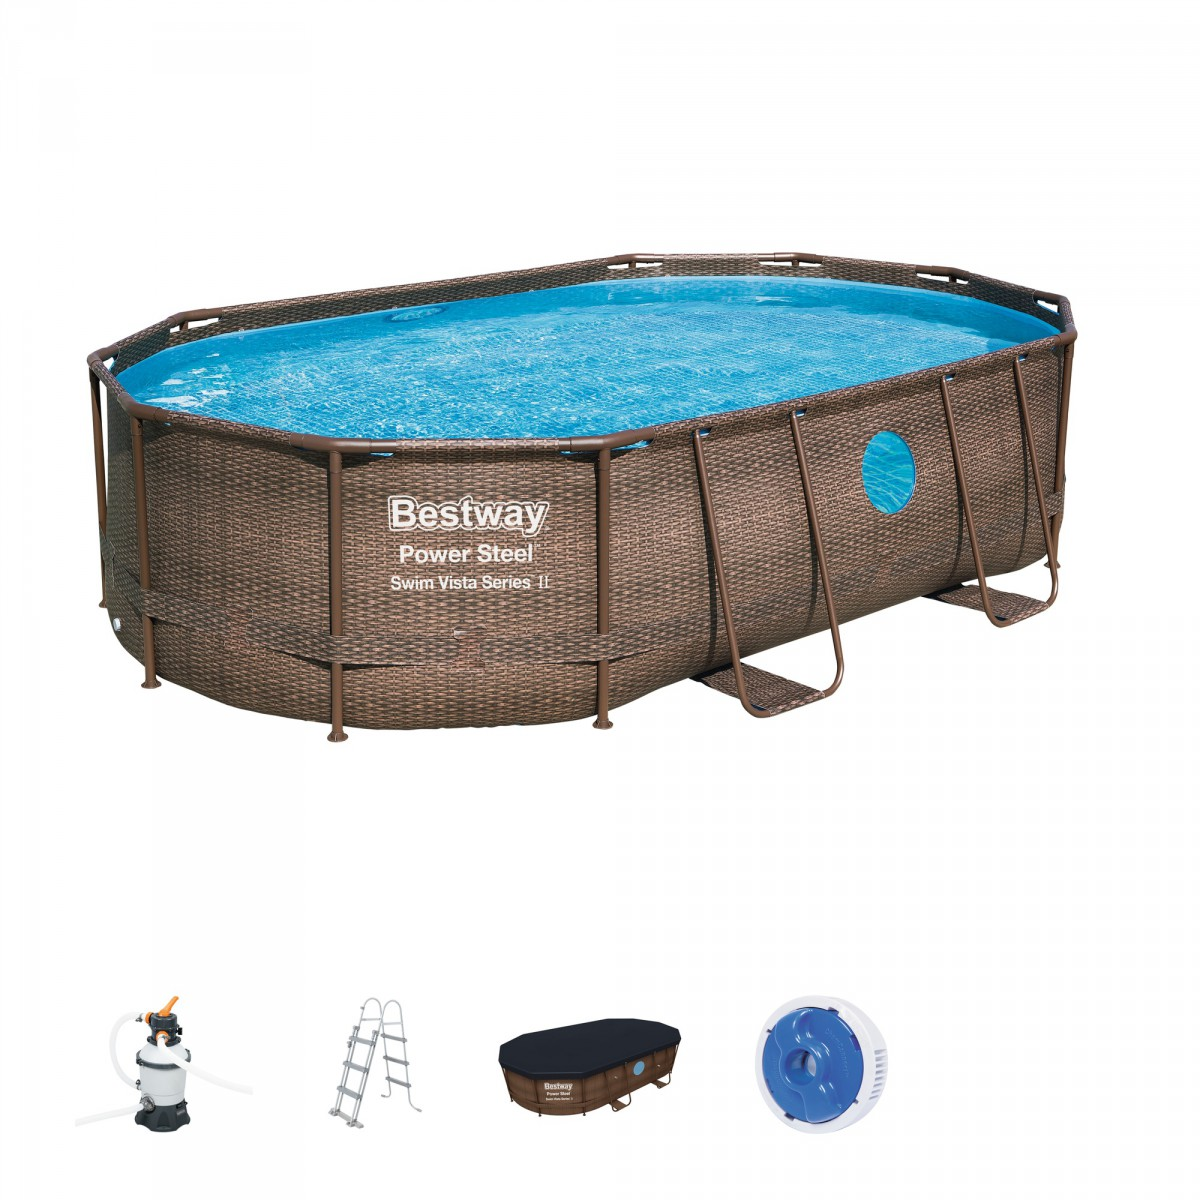 Piscine hors-sol ovale Power Steel™ Swim Vista Bestway - 488 x 305 x 107 cm